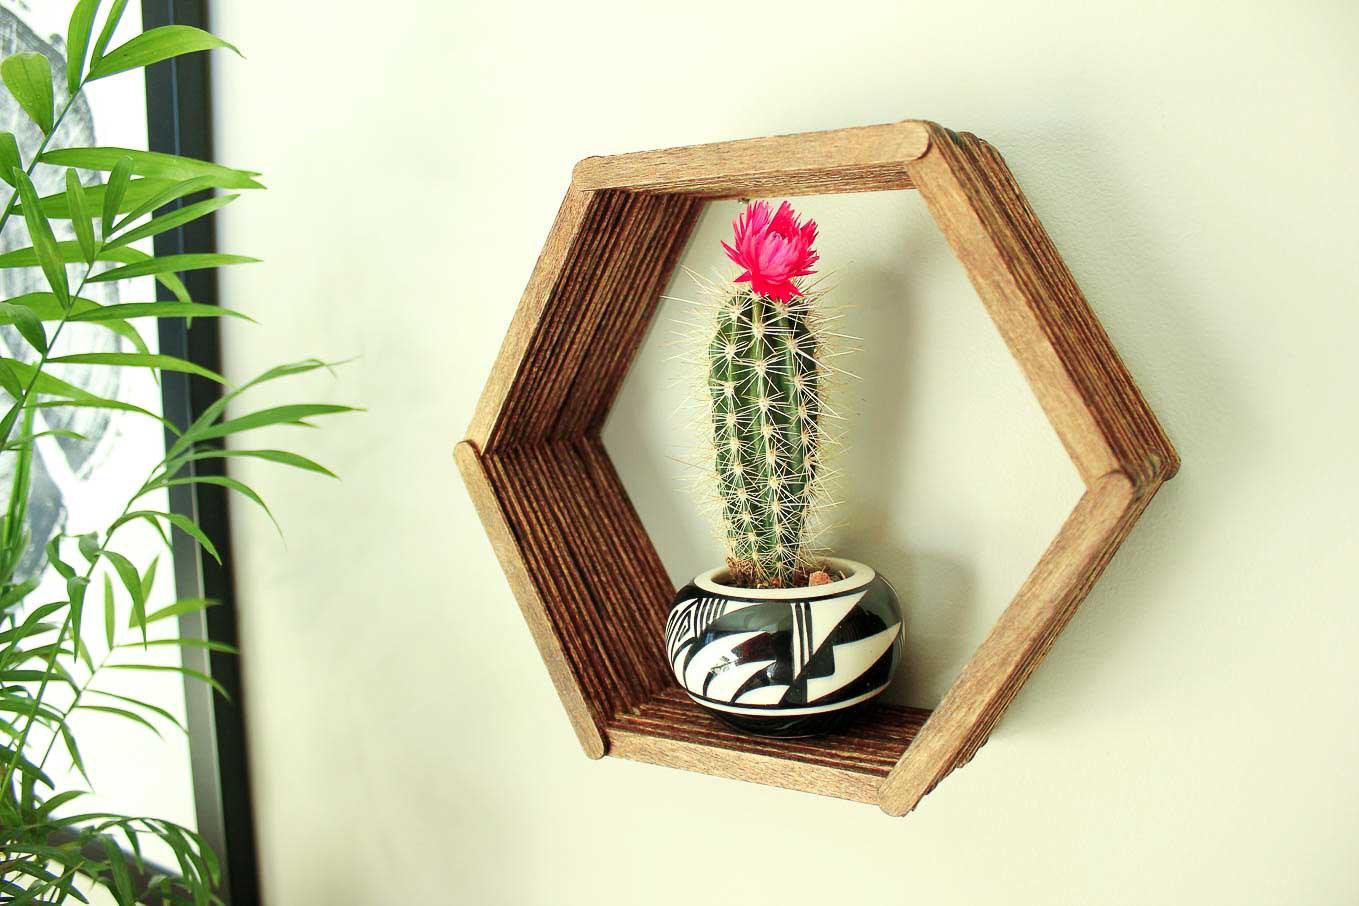 diy-hexagon-shelf-popsicle-sticks-3.jpg